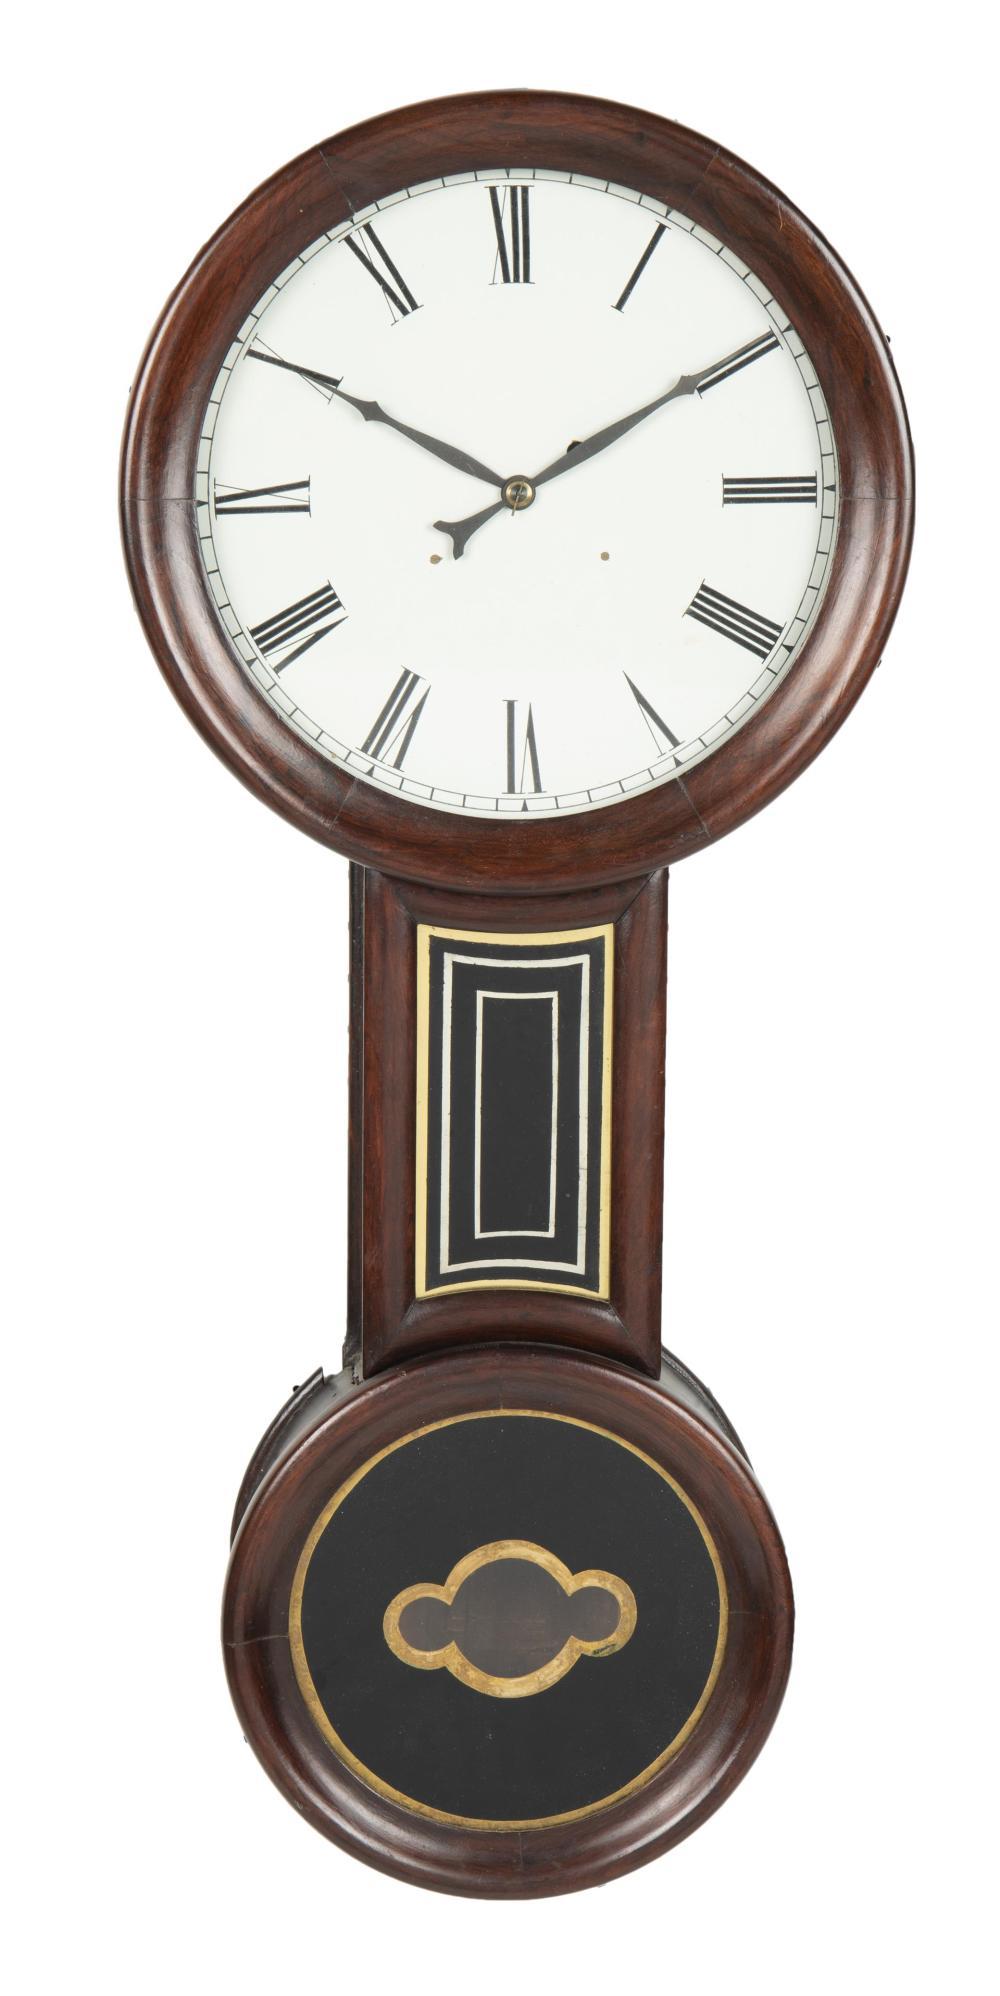 A Baltimore-style clock